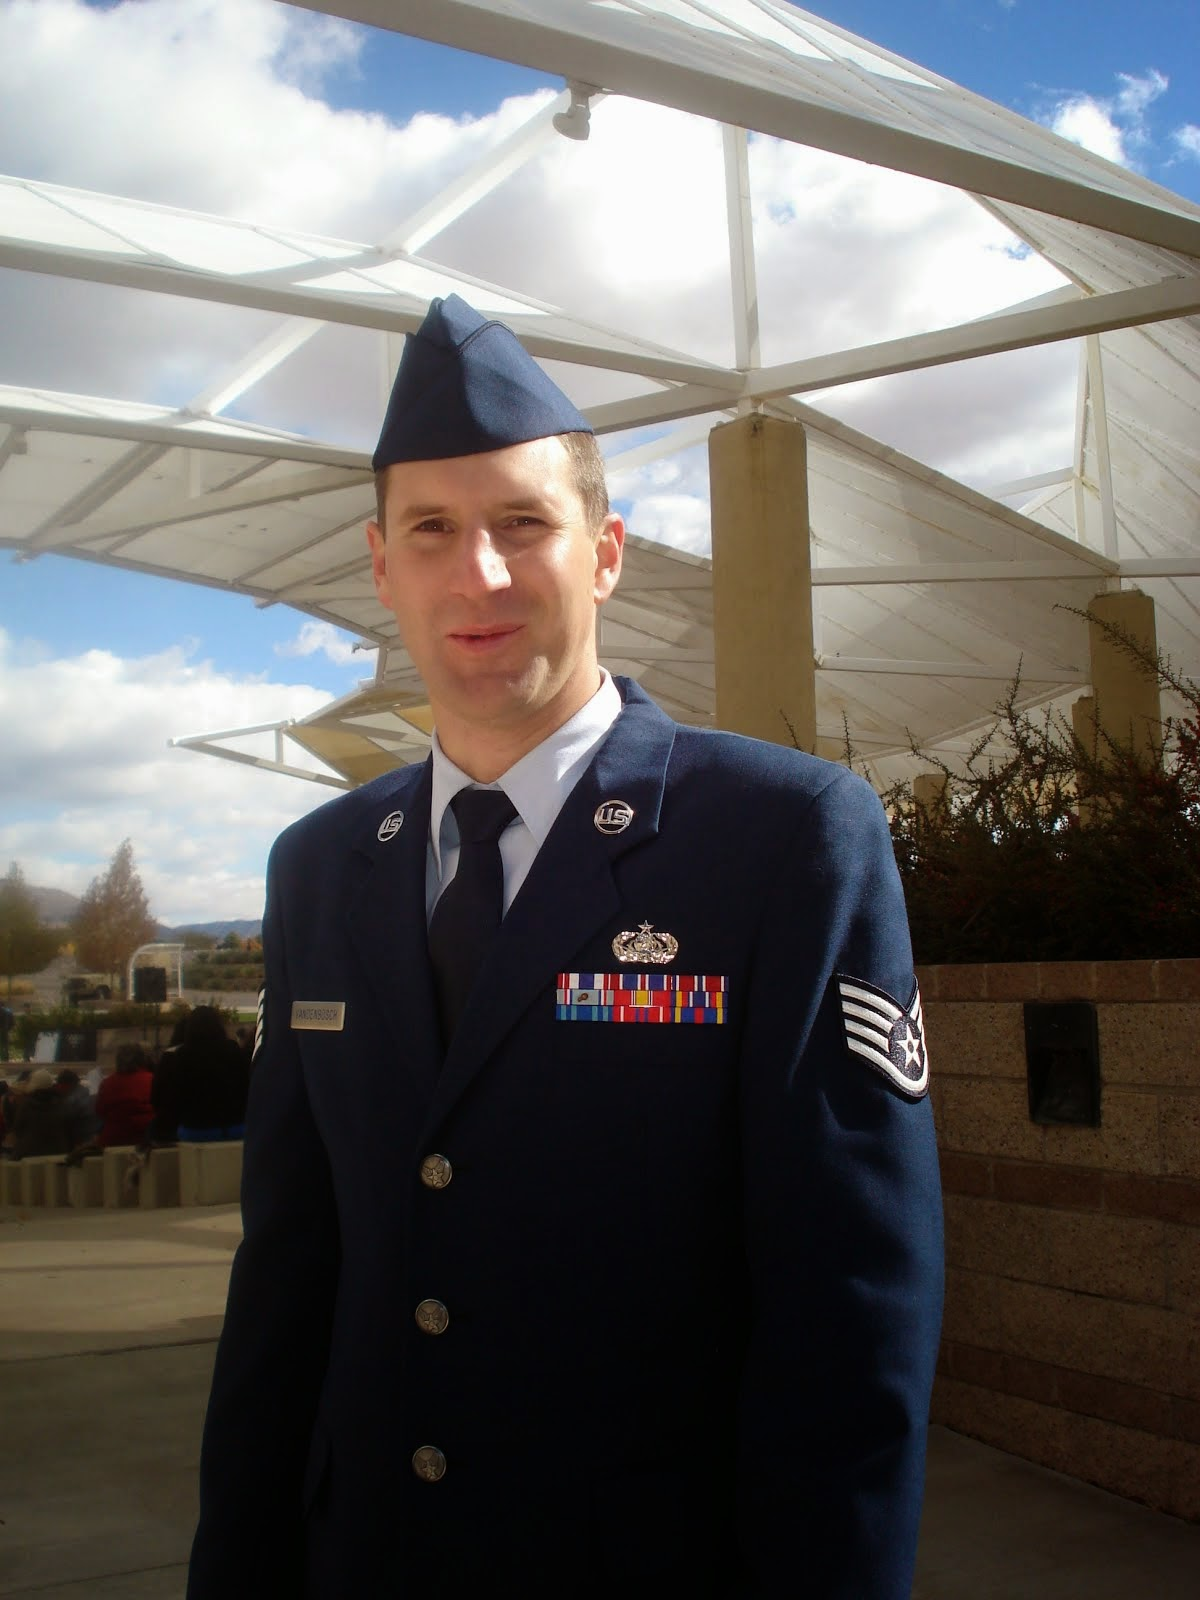 Proud Airman